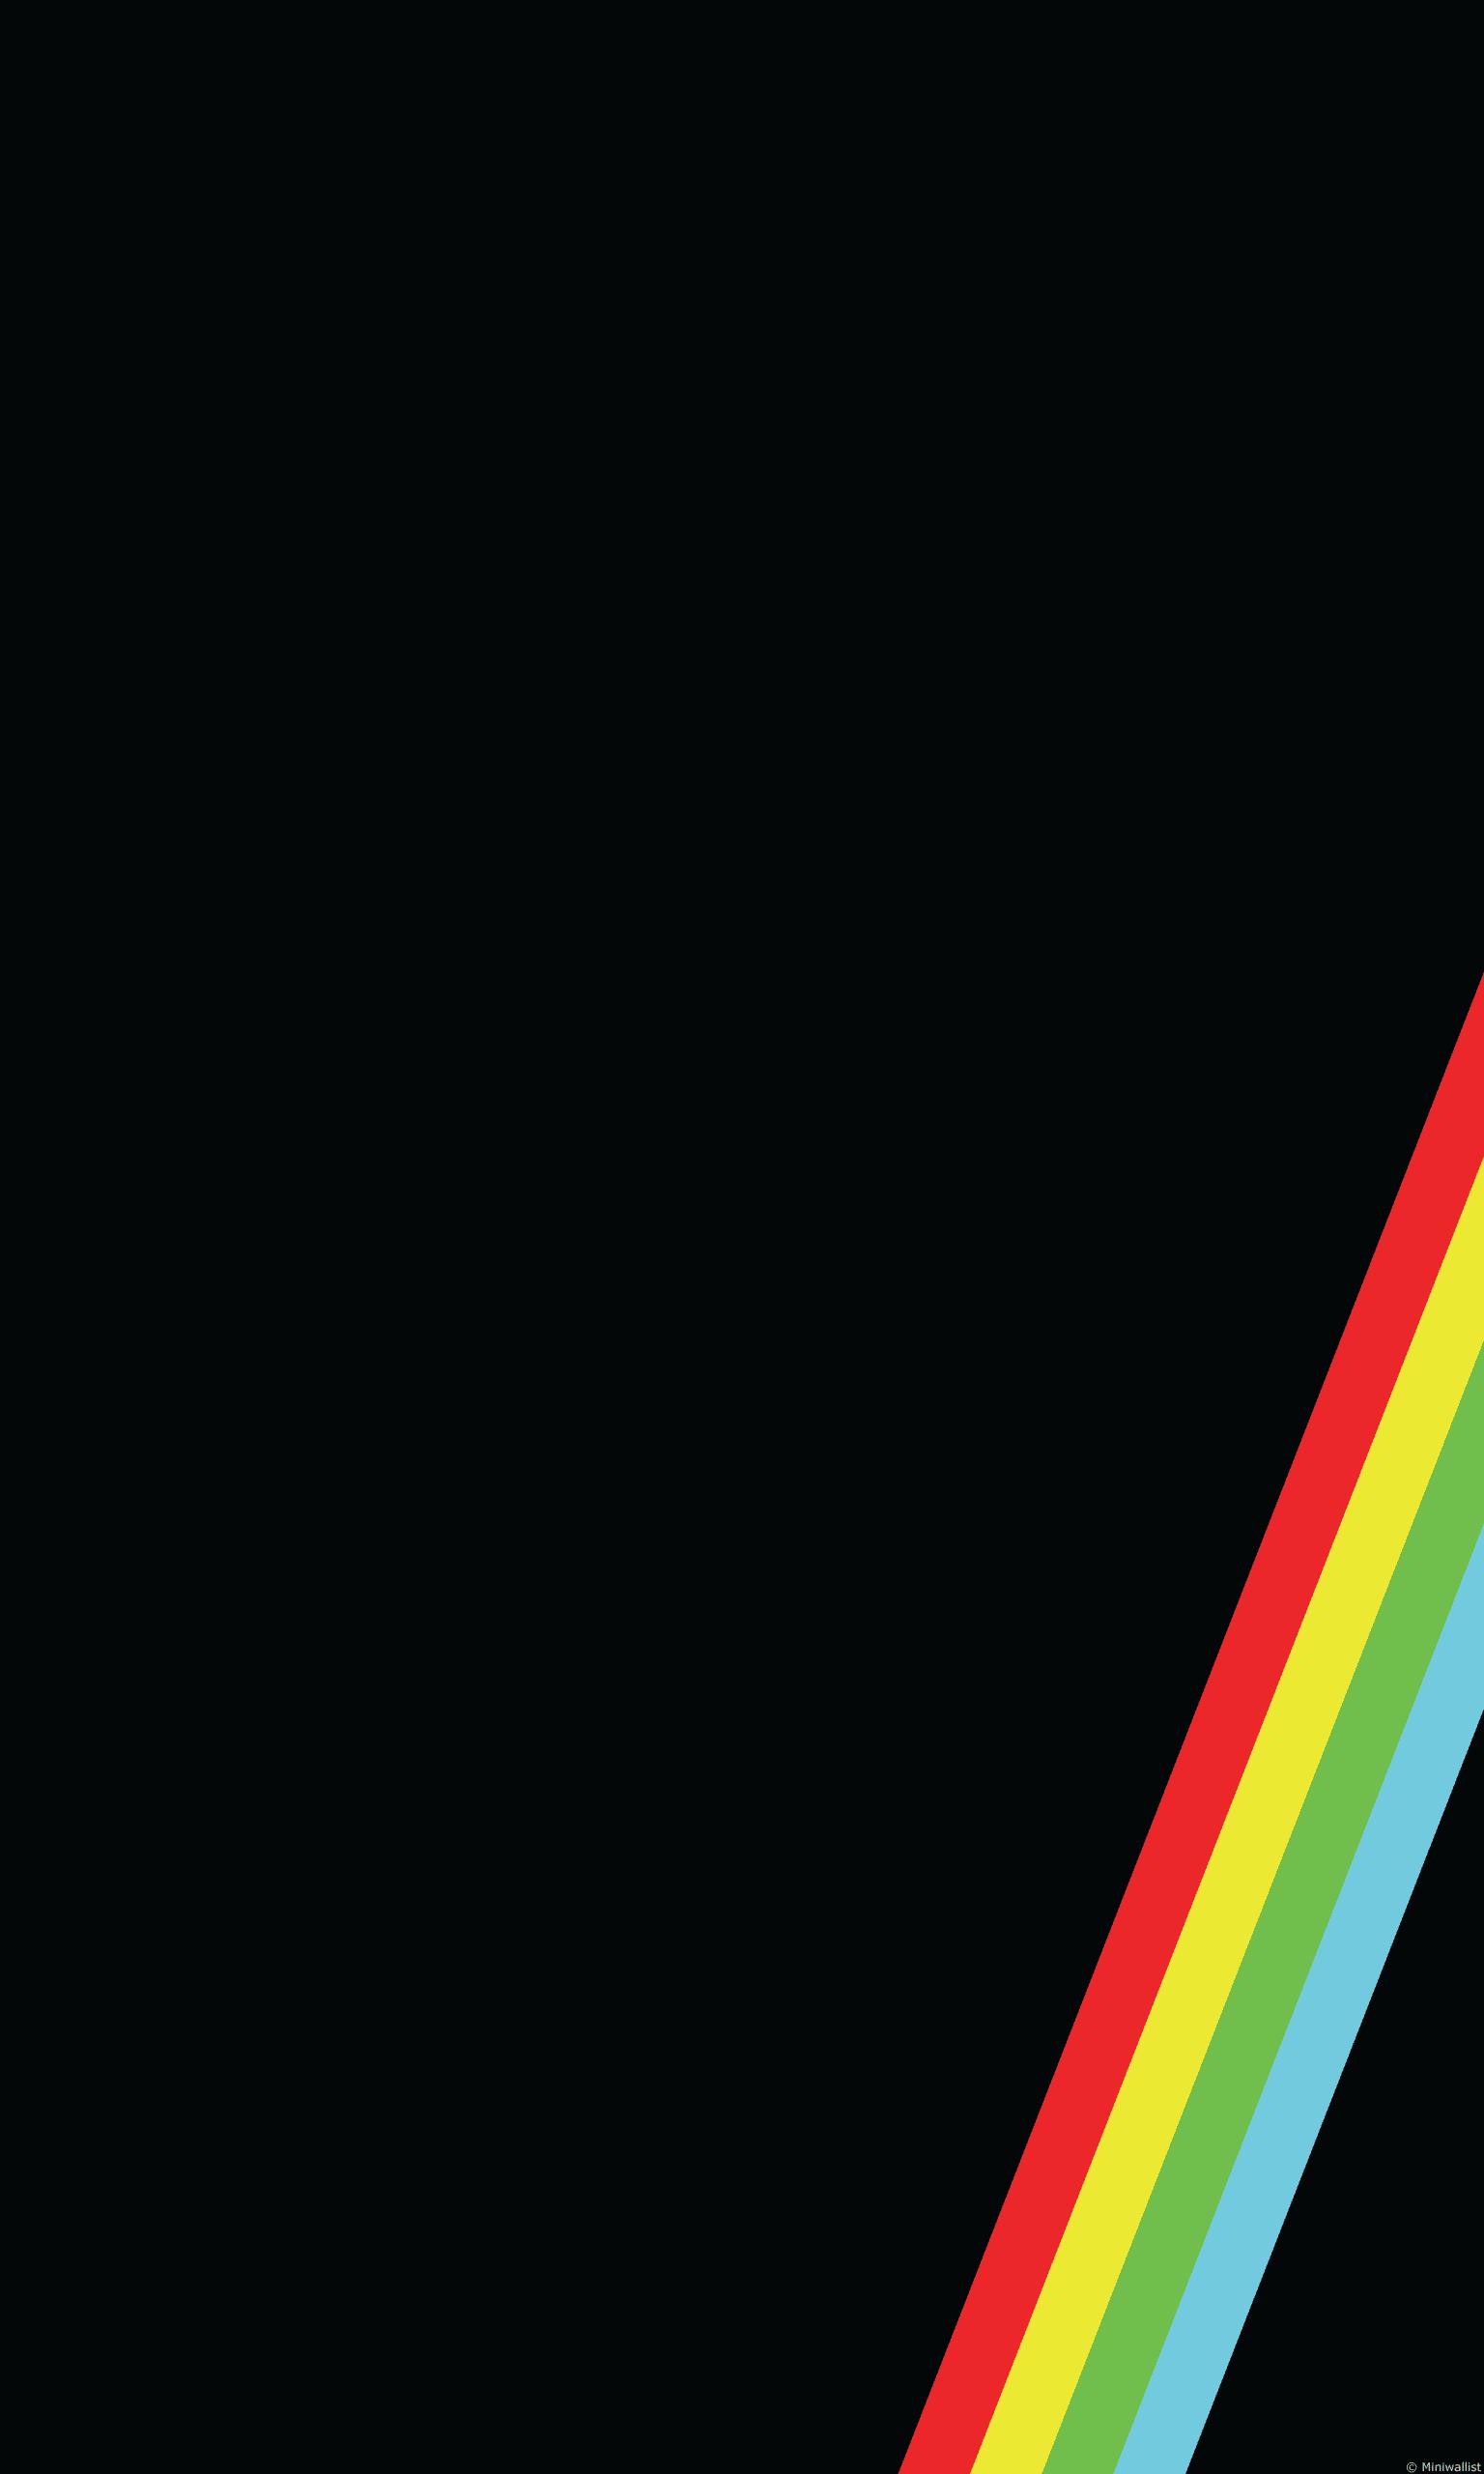 Beautiful Wallpaper Logo Htc - zx-spectrum-mobile-wallpaper-minimalist-1536x2560  HD_548517.png